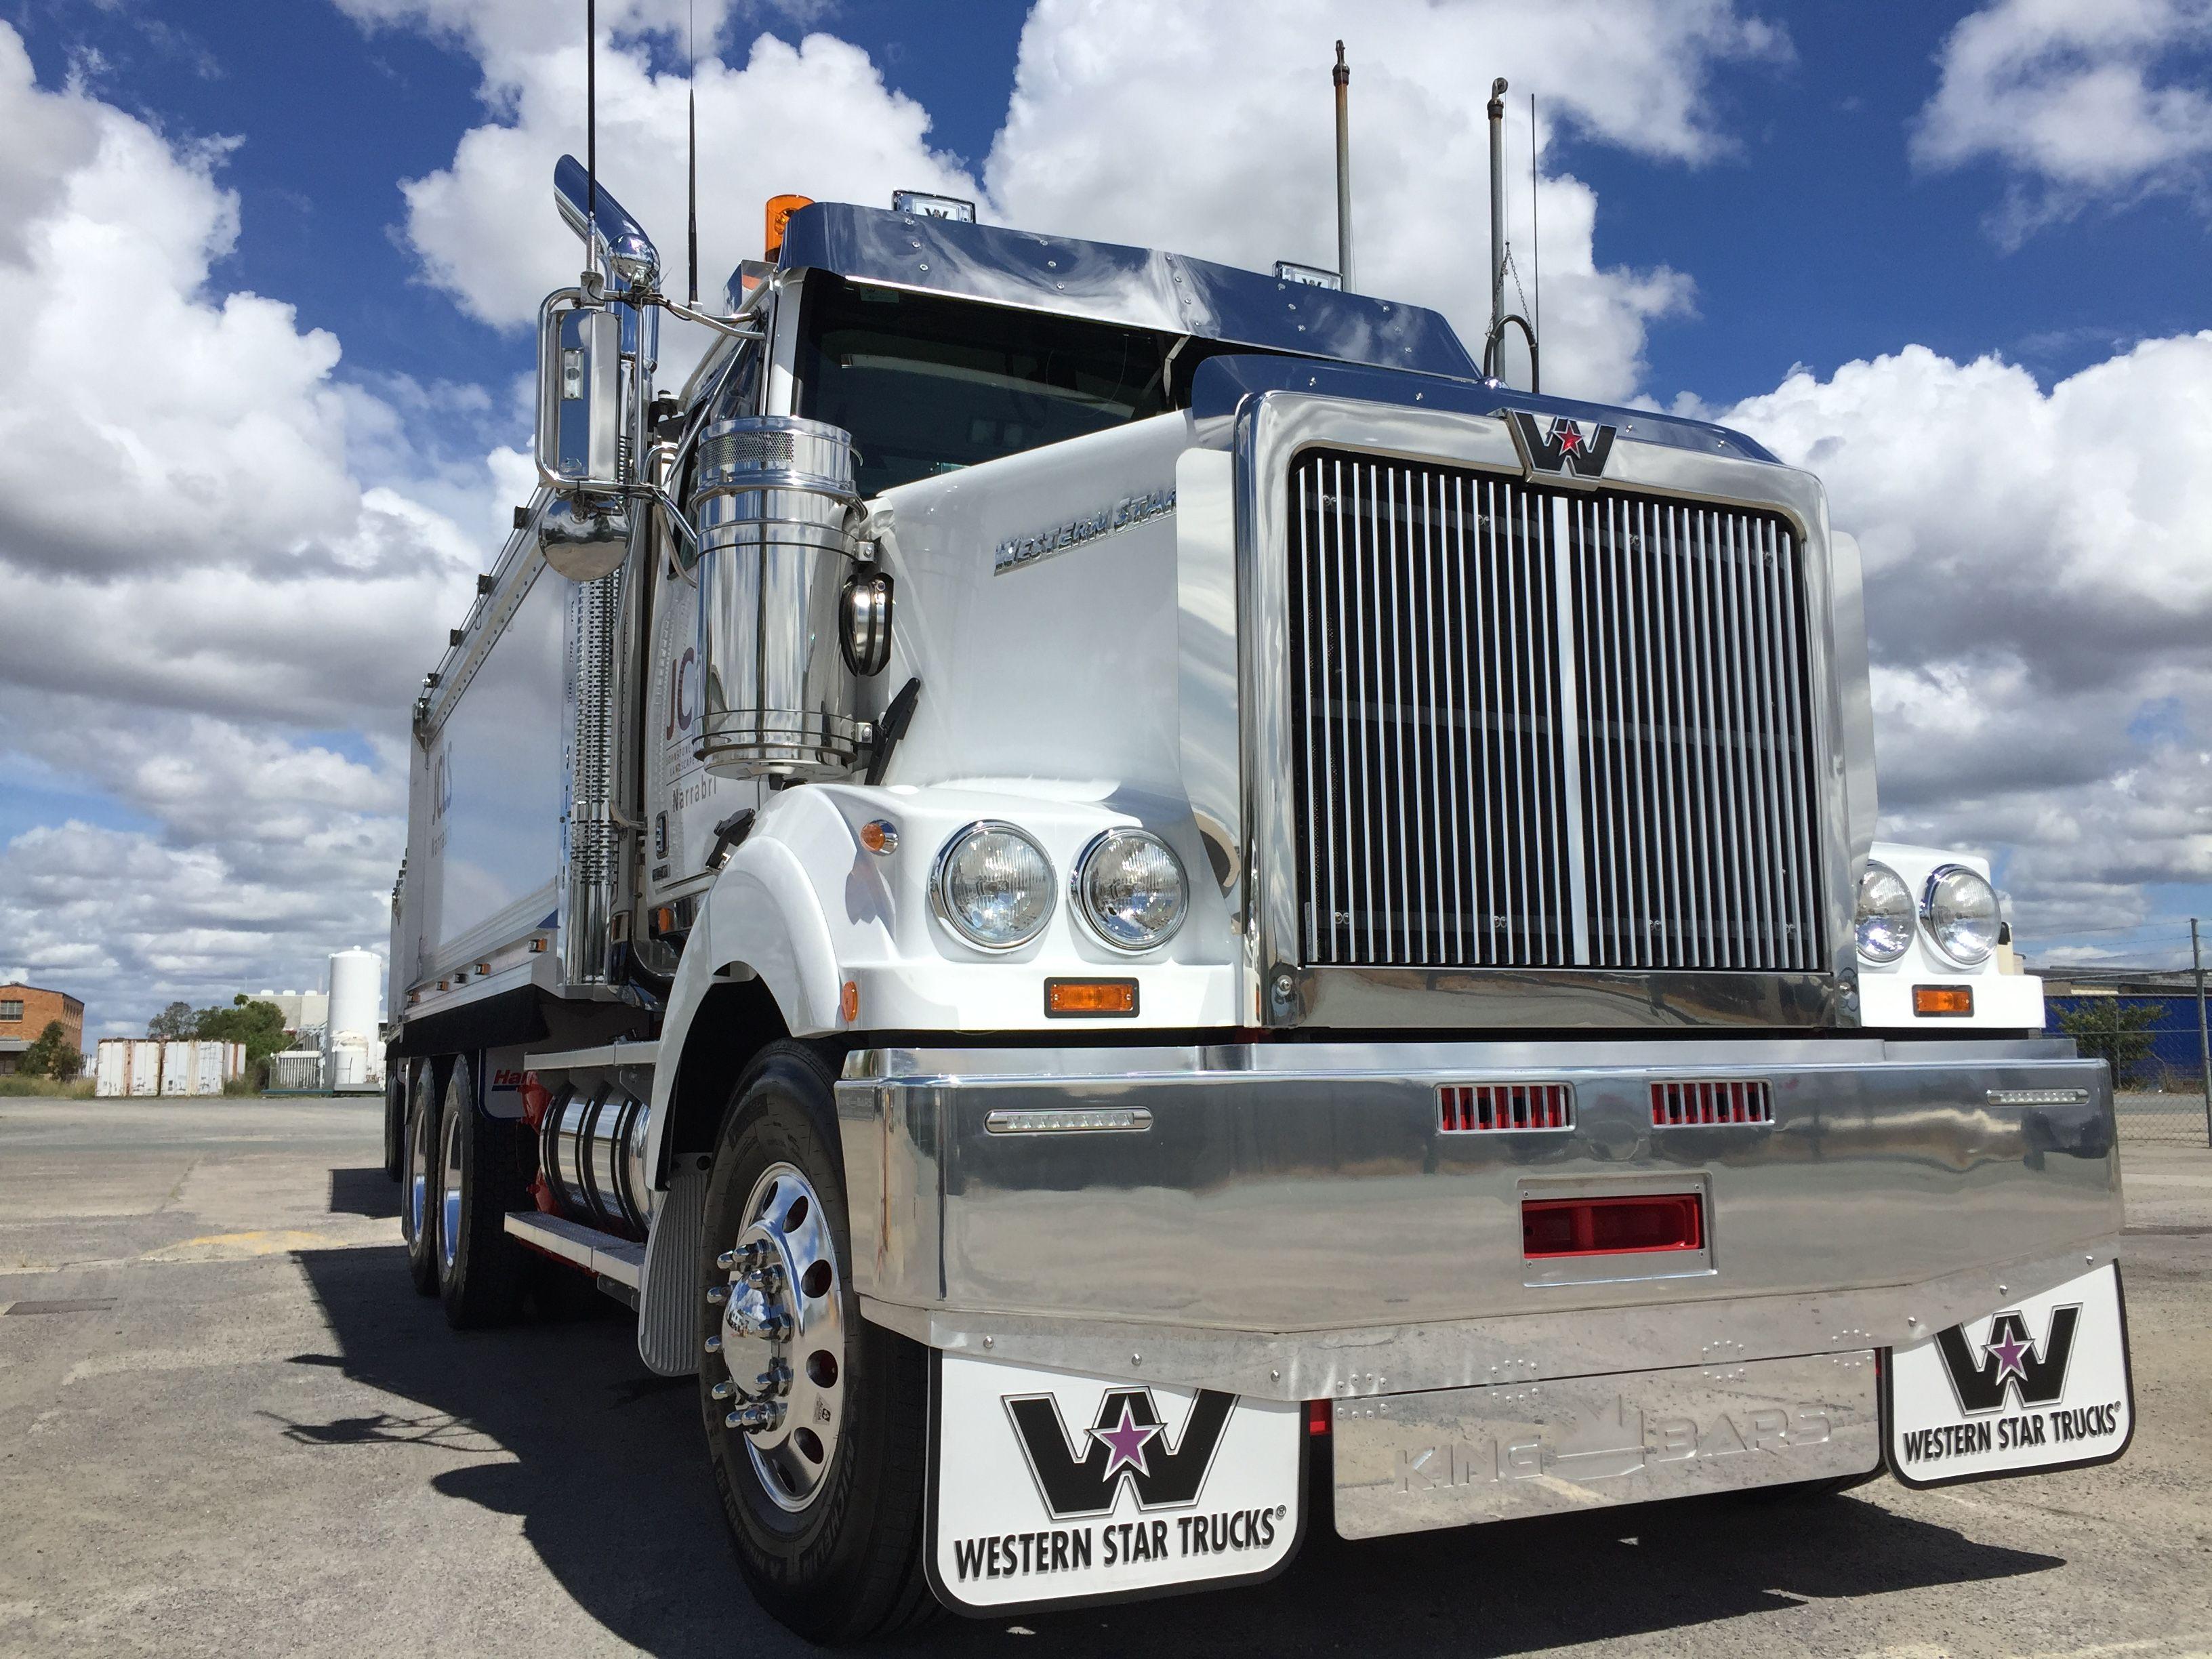 Pin By Arran Glass On Western Star Trucks Western Star Trucks Big Trucks Trucks